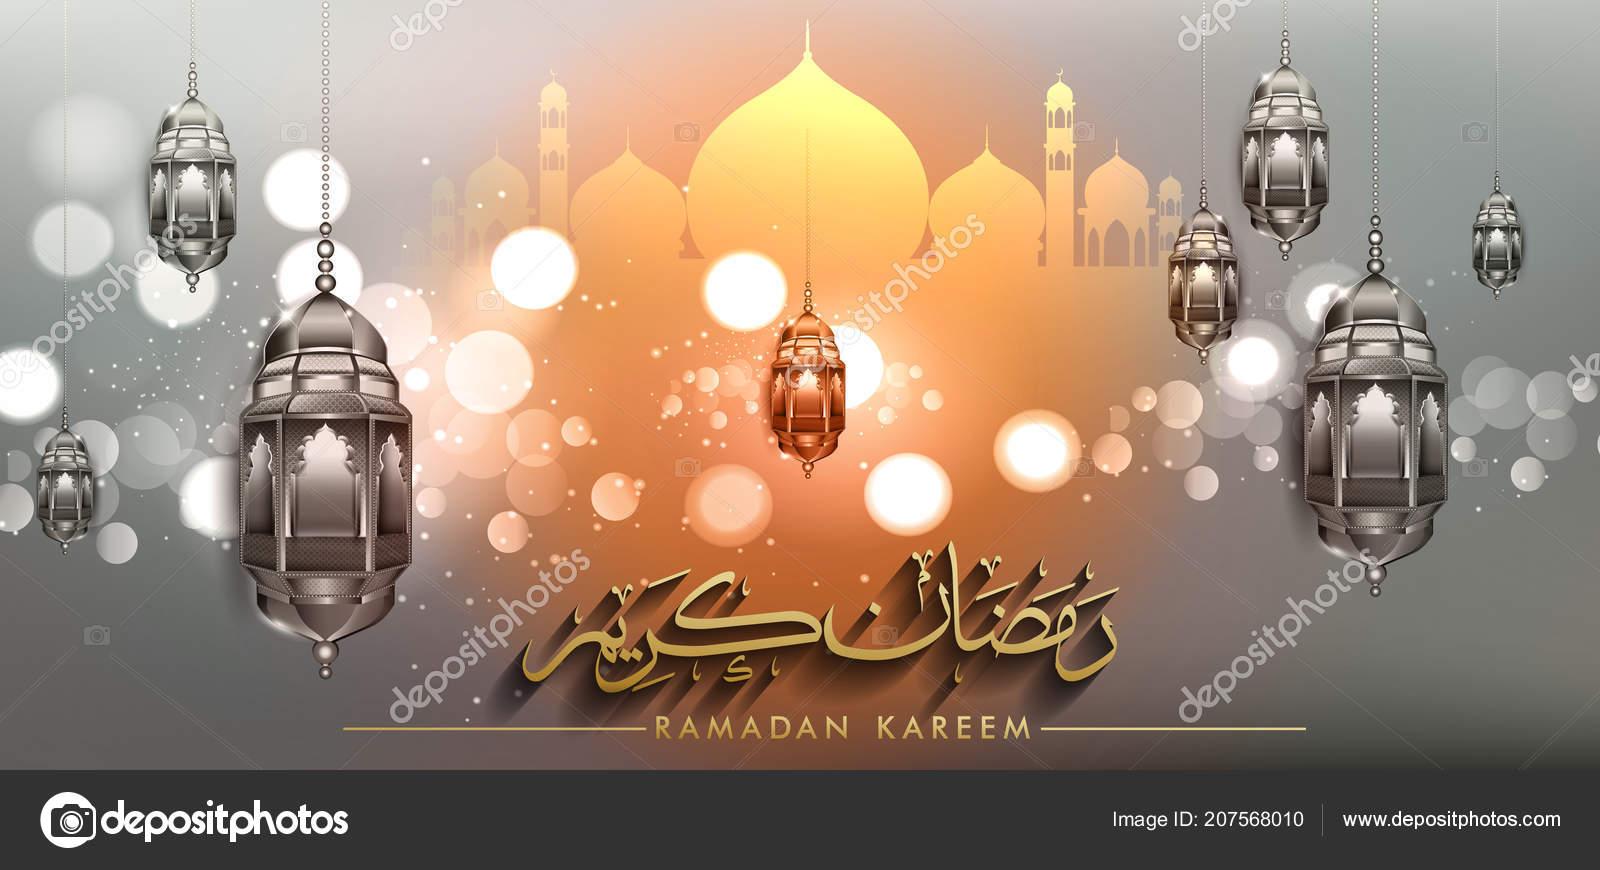 Ramadan Greetings Background Elegant Greetings Card Design Template